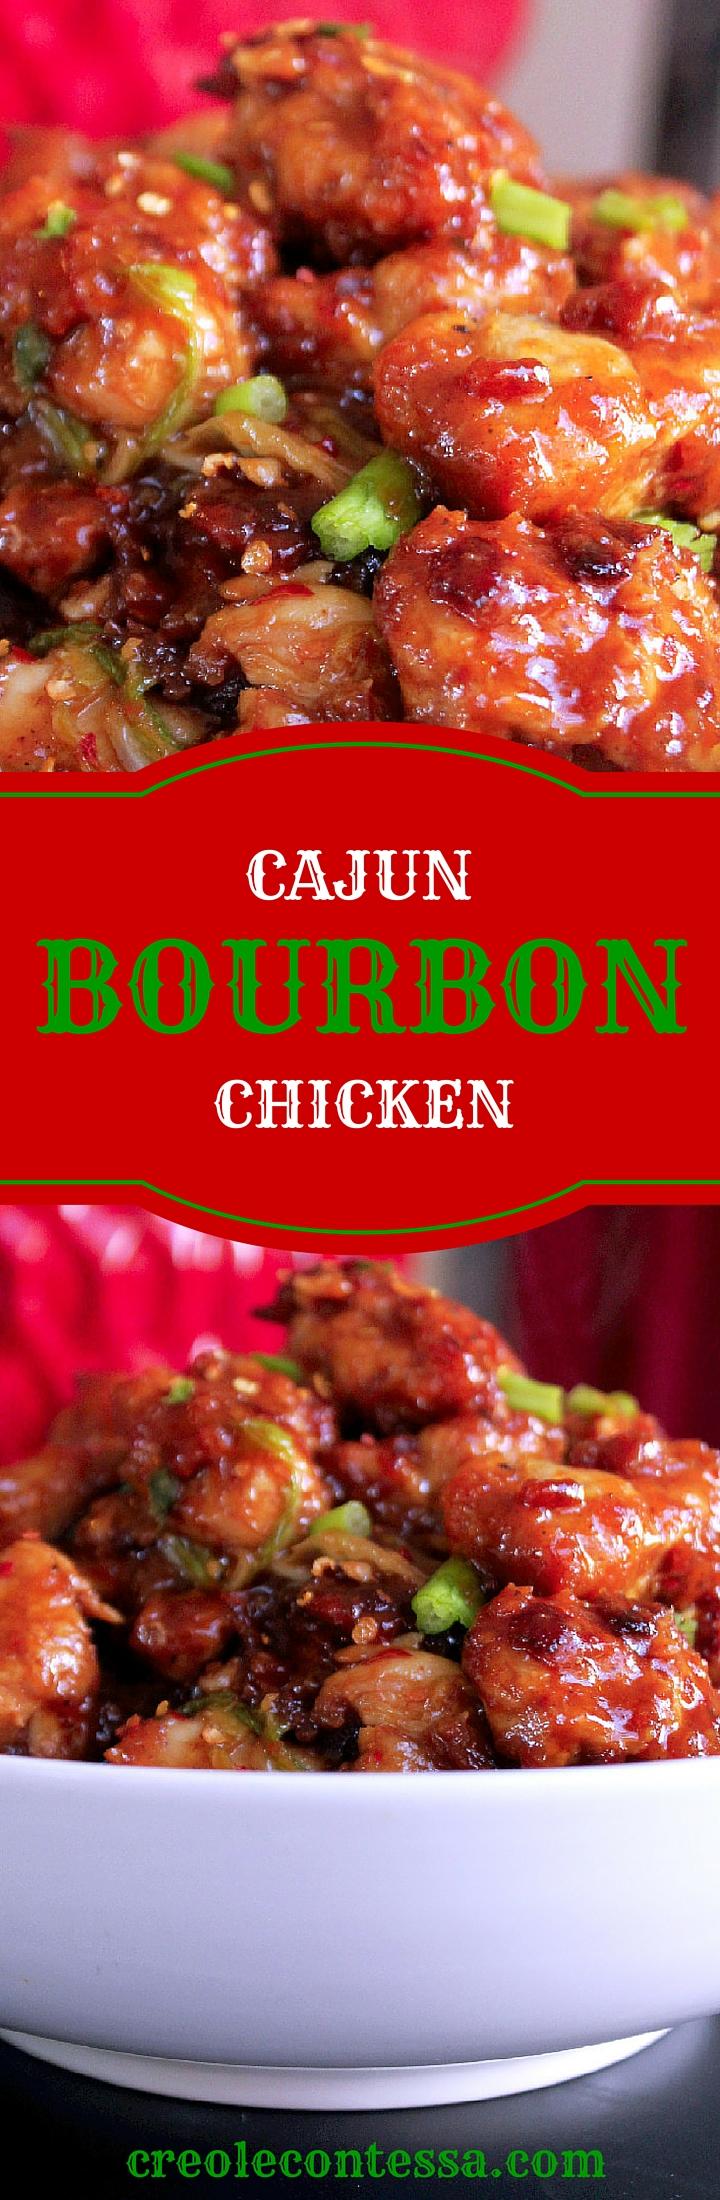 Cajun Bourbon Chicken-Creole Contessa